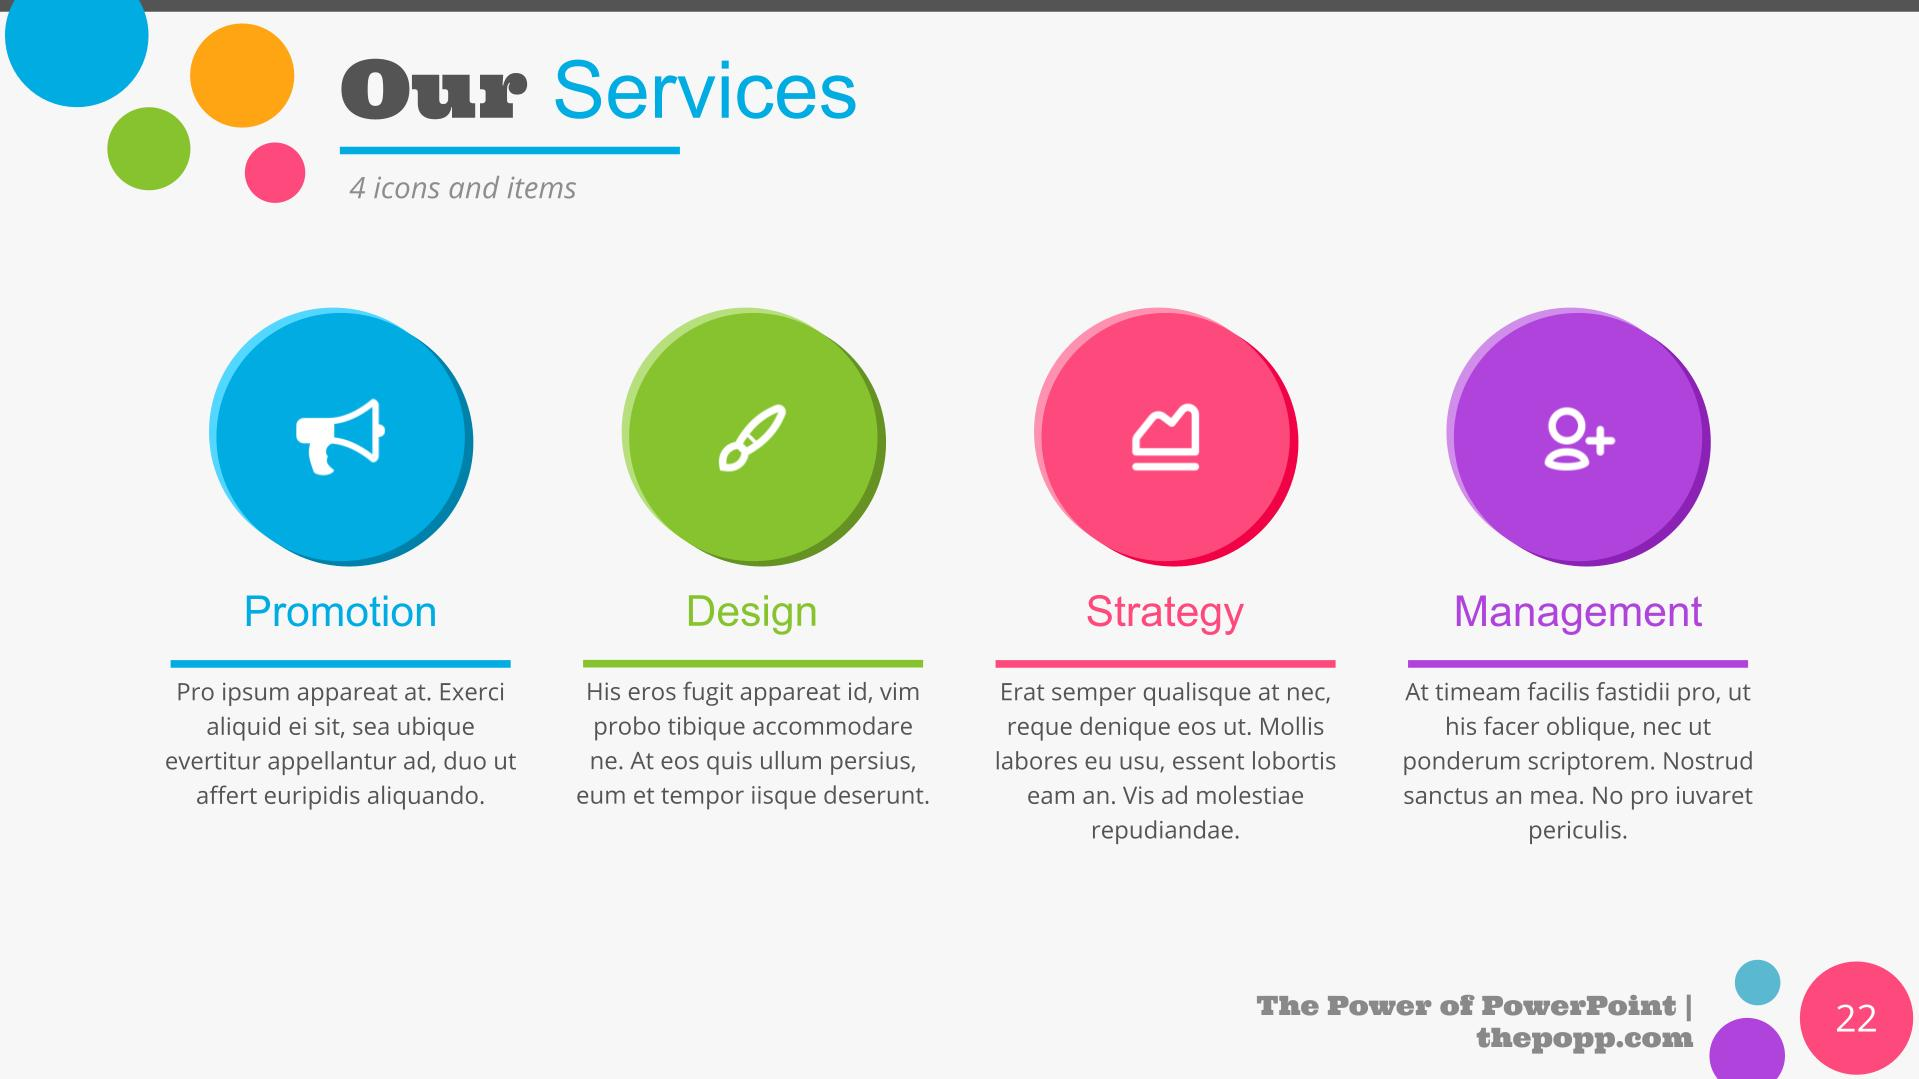 Description of services through infographics.